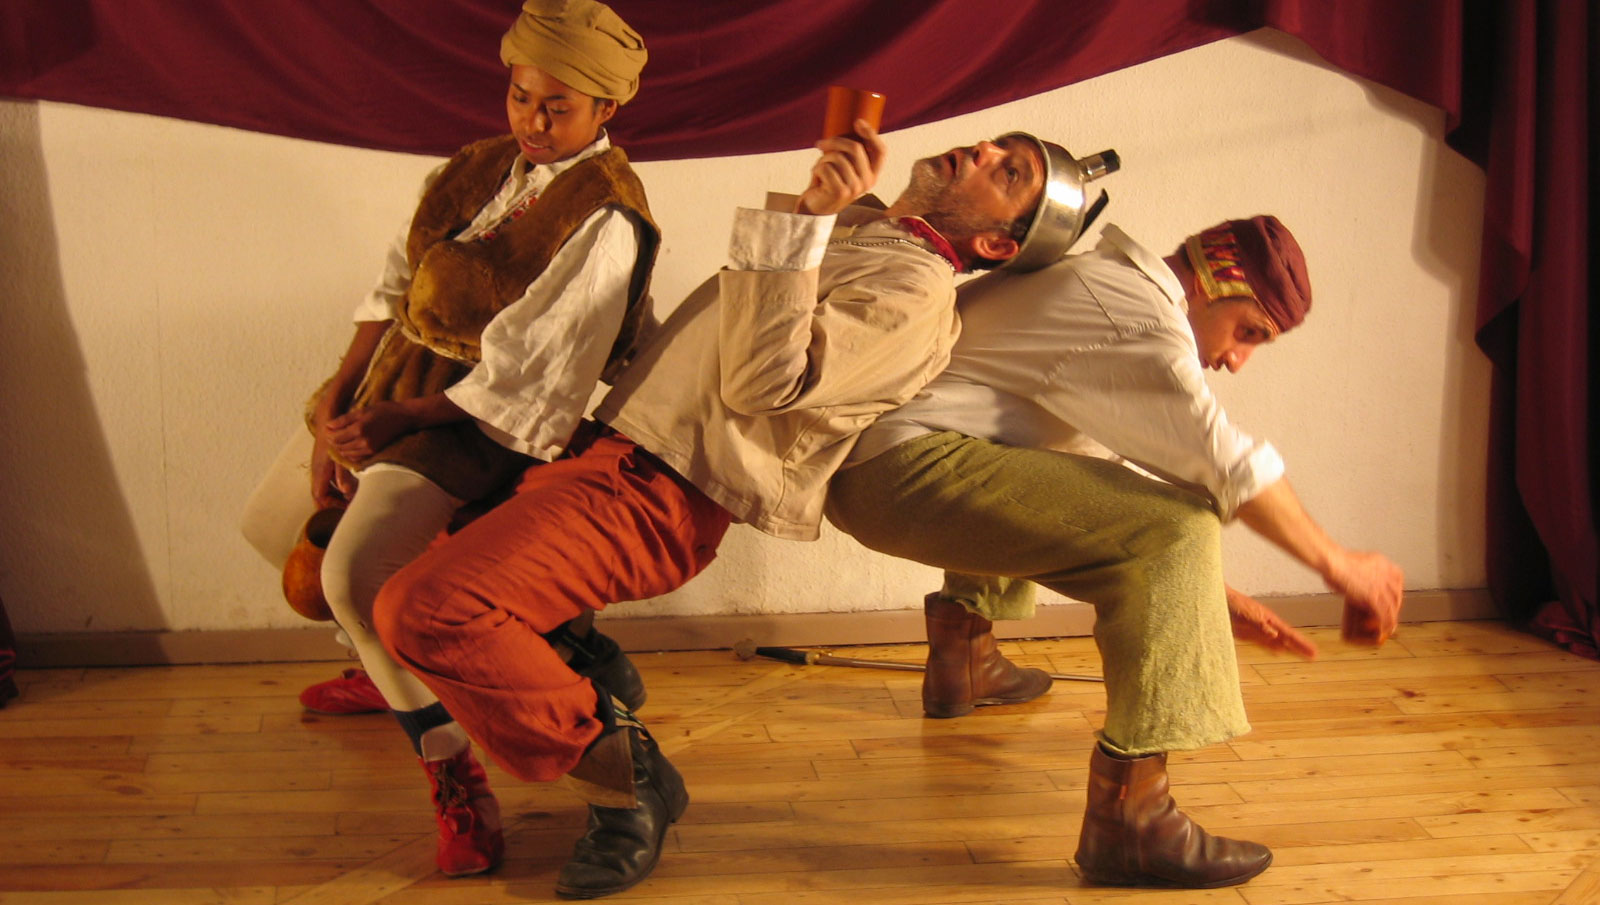 Don Quijote en furia / Don Quixote in Rage